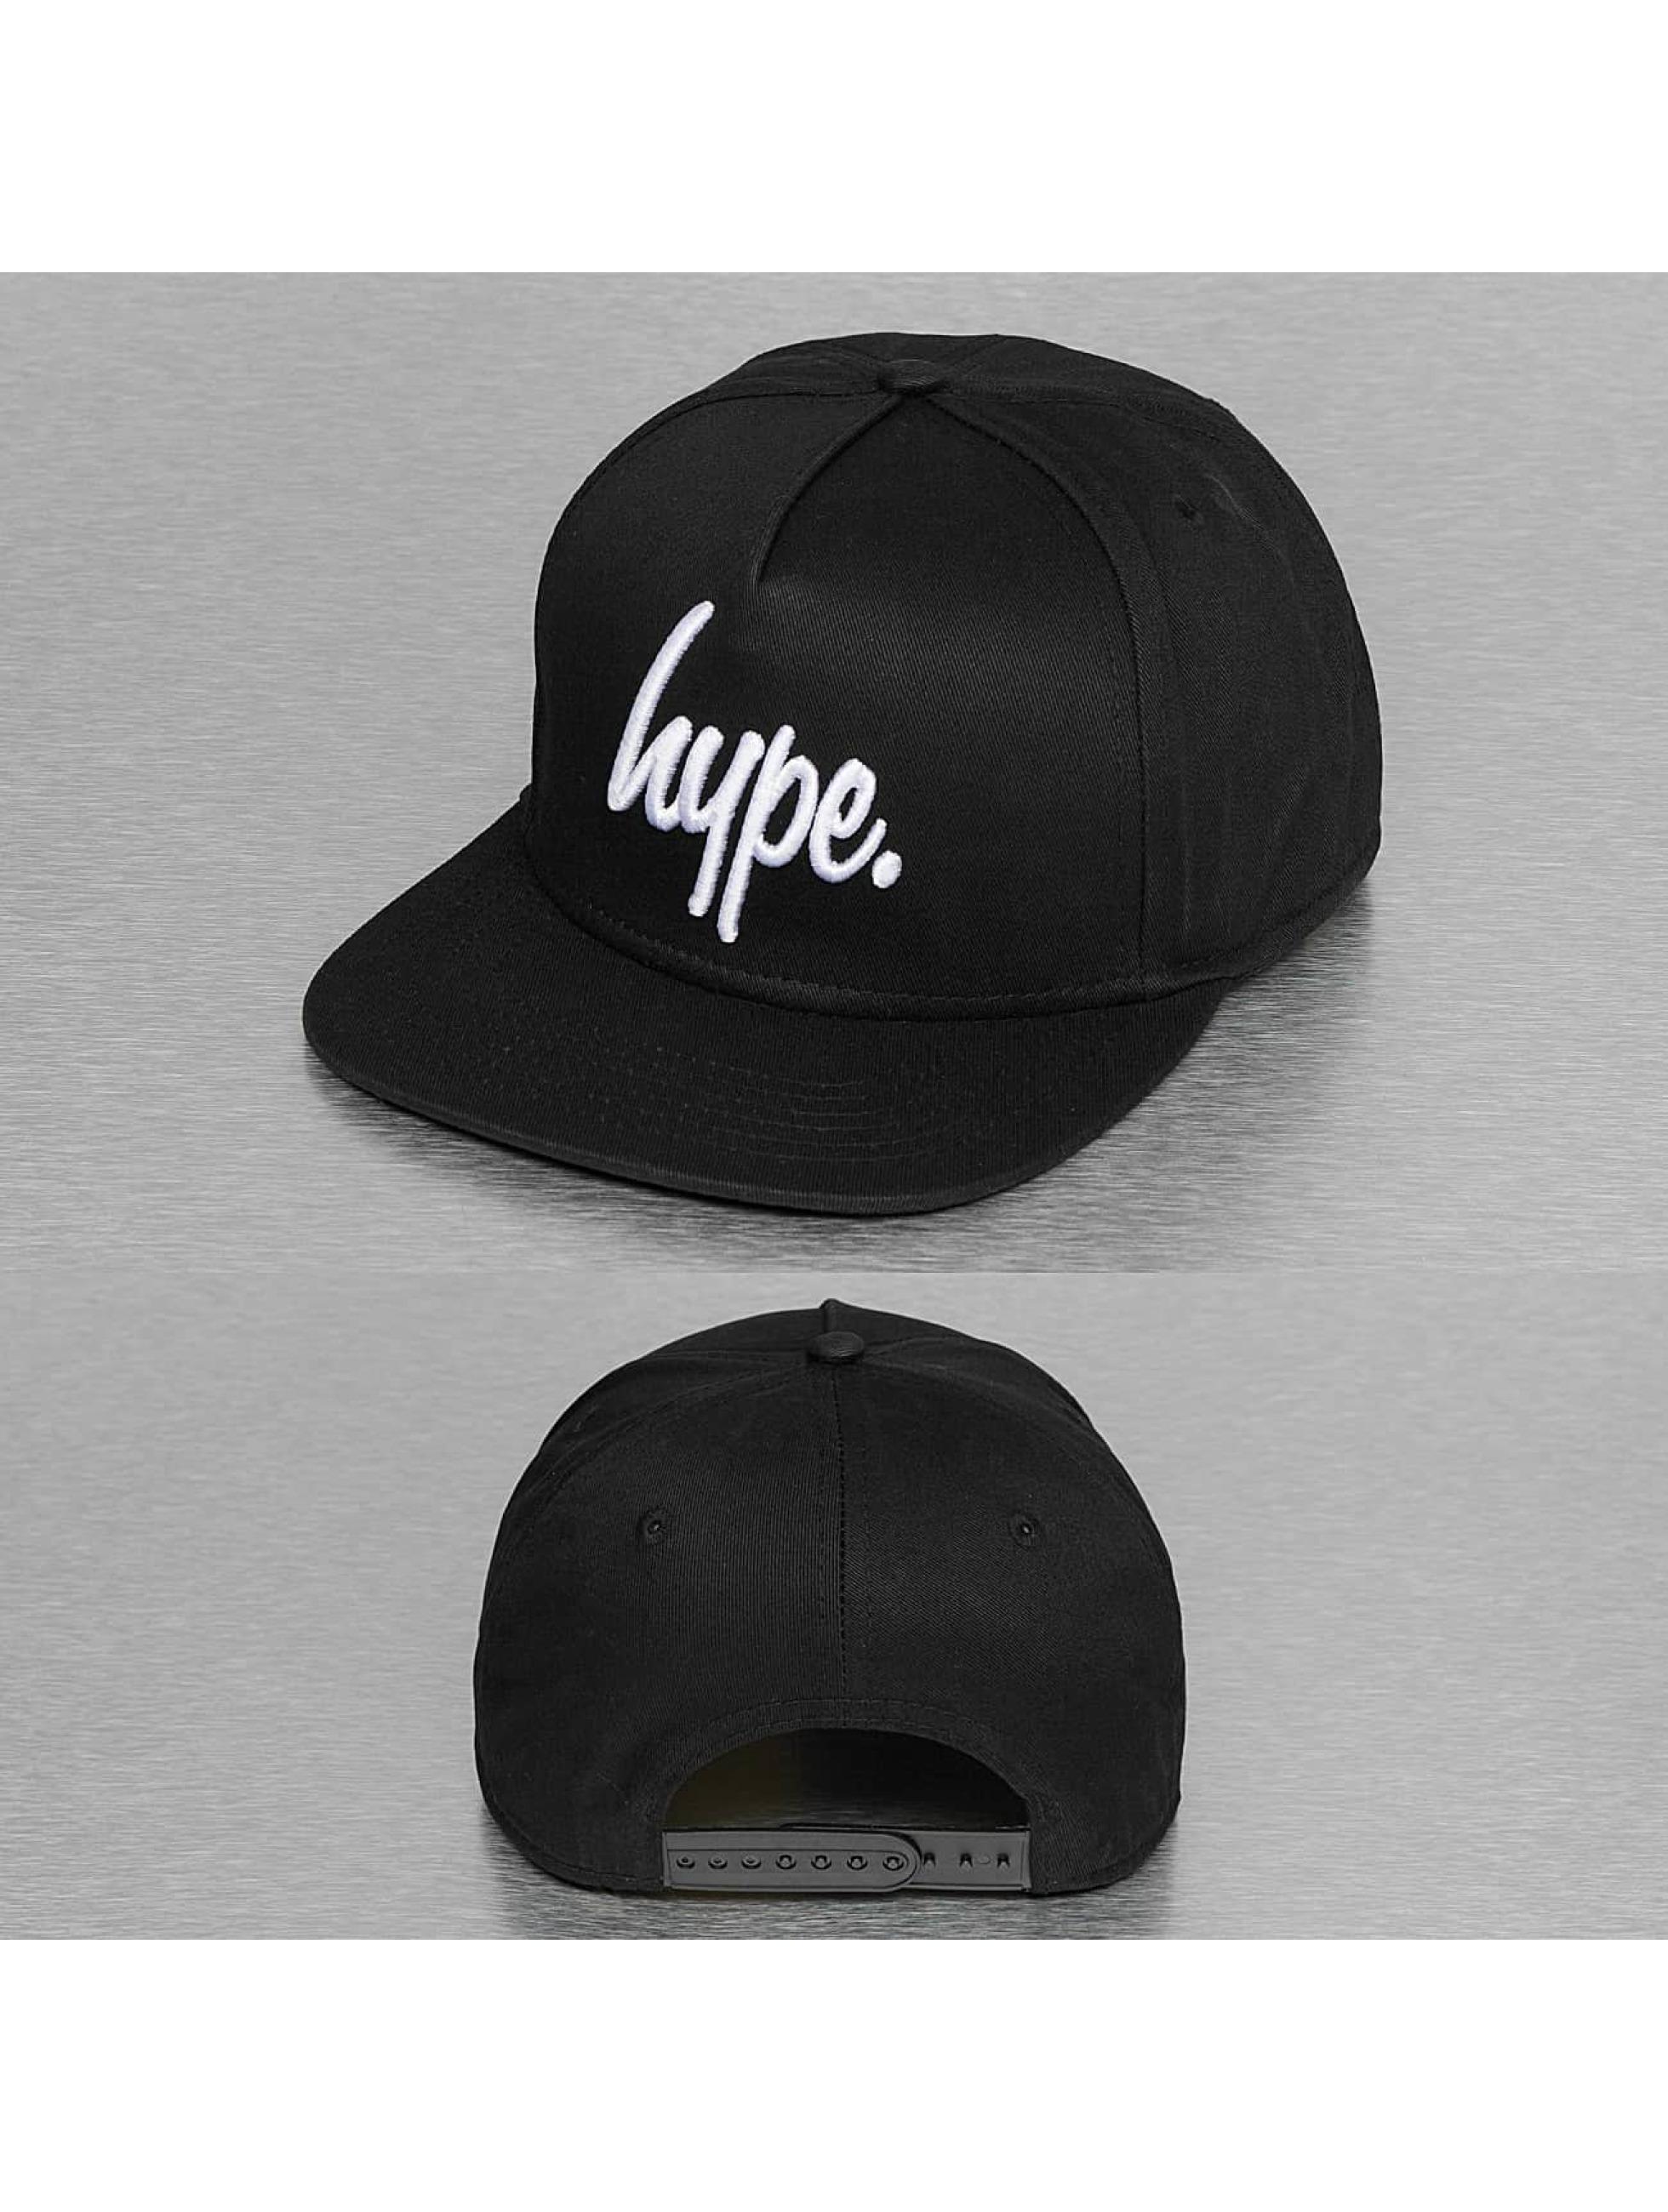 HYPE Männer,Frauen Snapback Cap Script in schwarz